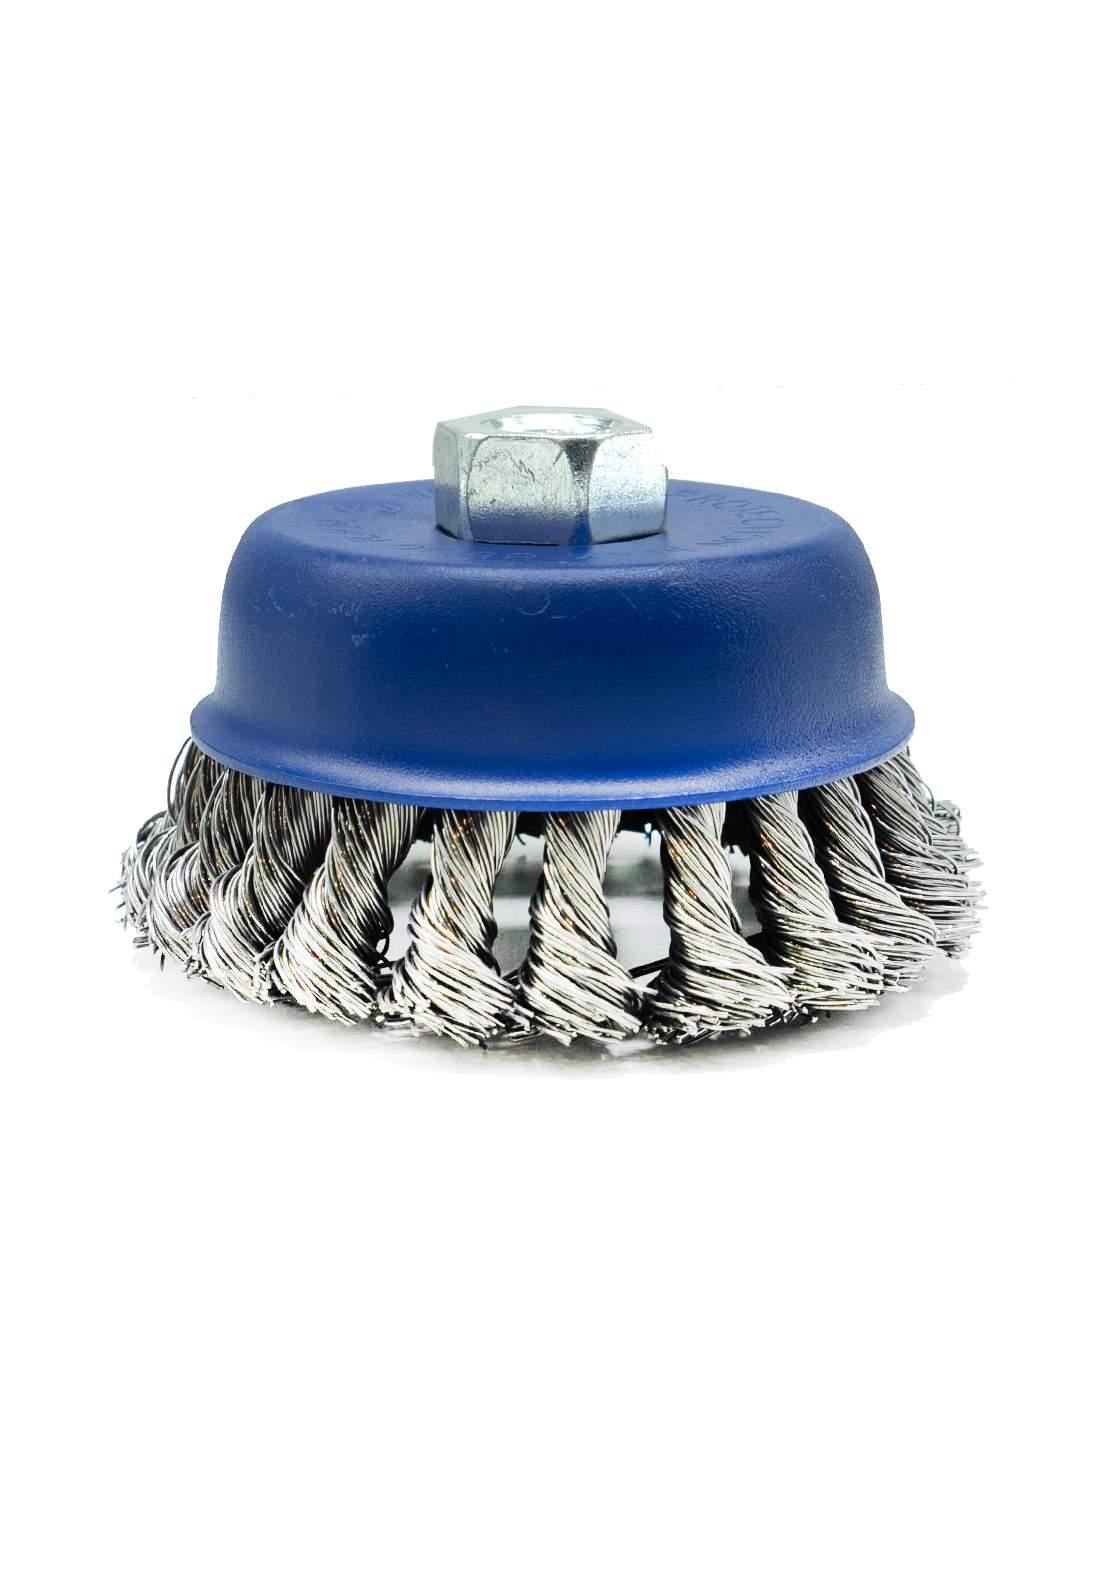 Sali 7223 Brush Inox For Drilling Machine 120 mm فرشاة تنظيف الاسطح المعدنية